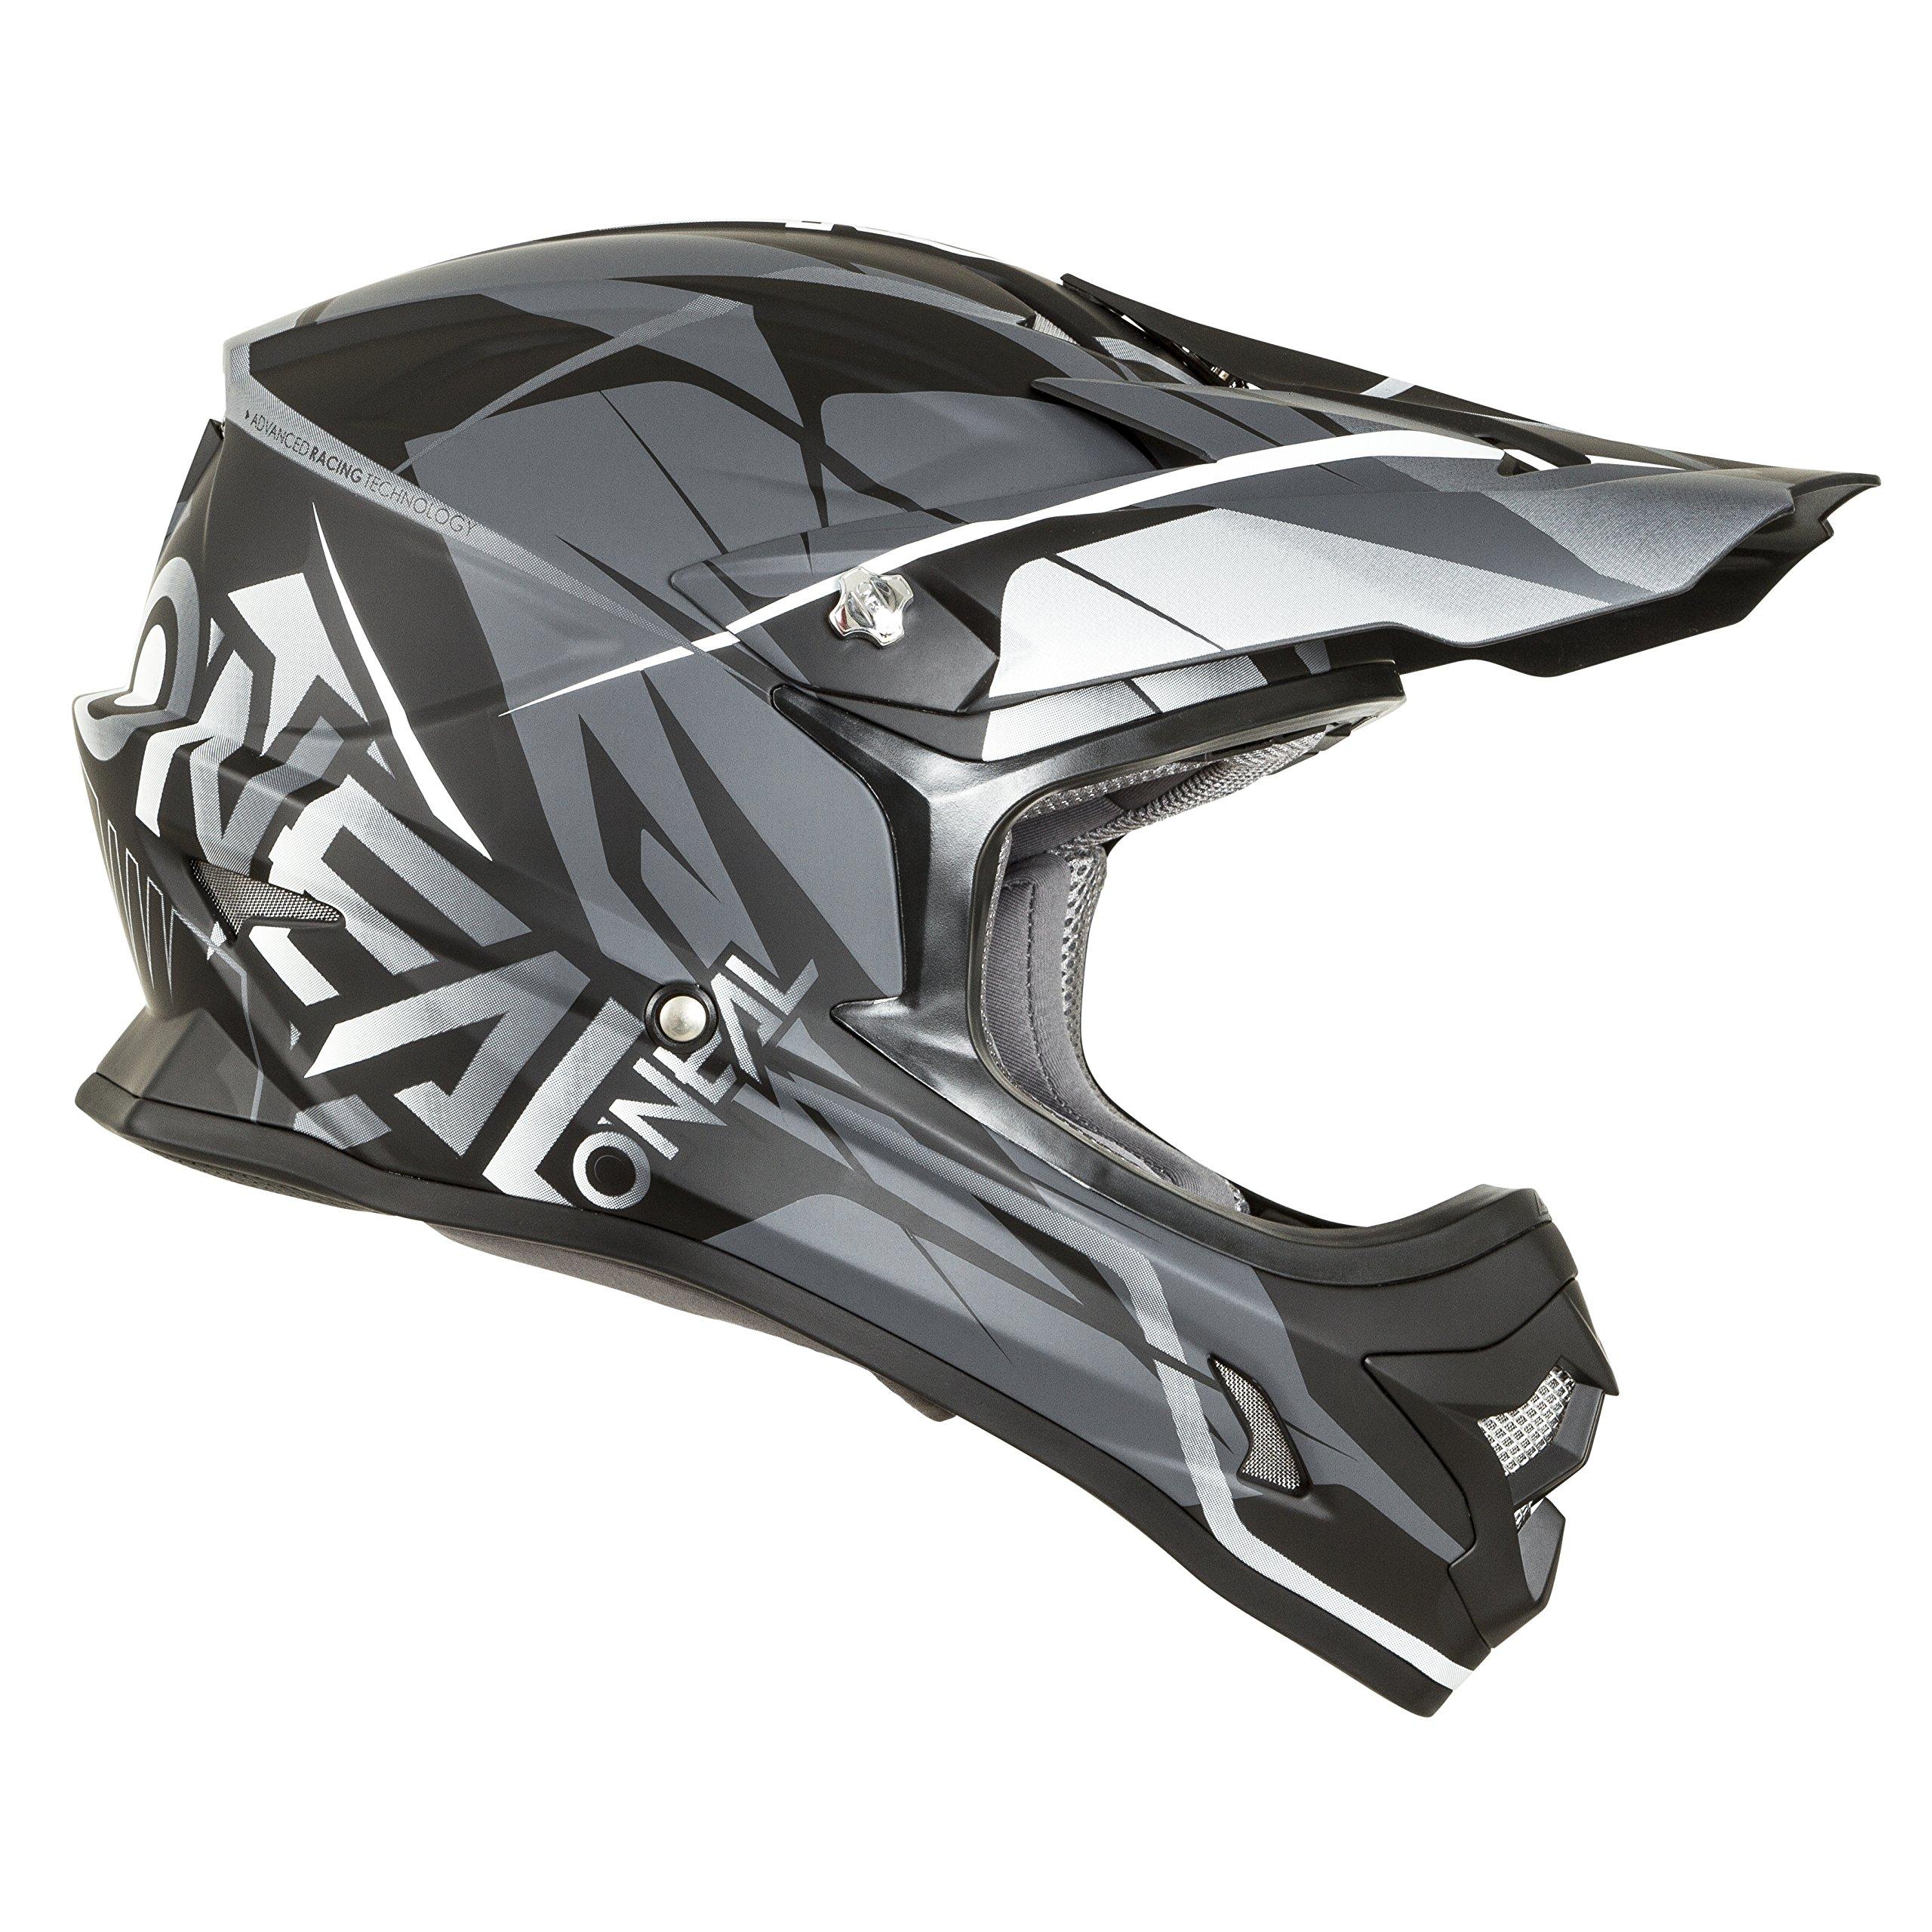 O'Neal 3 SRS Mens Off-Road Free Rider Helmet (Black/Grey, X-Large)